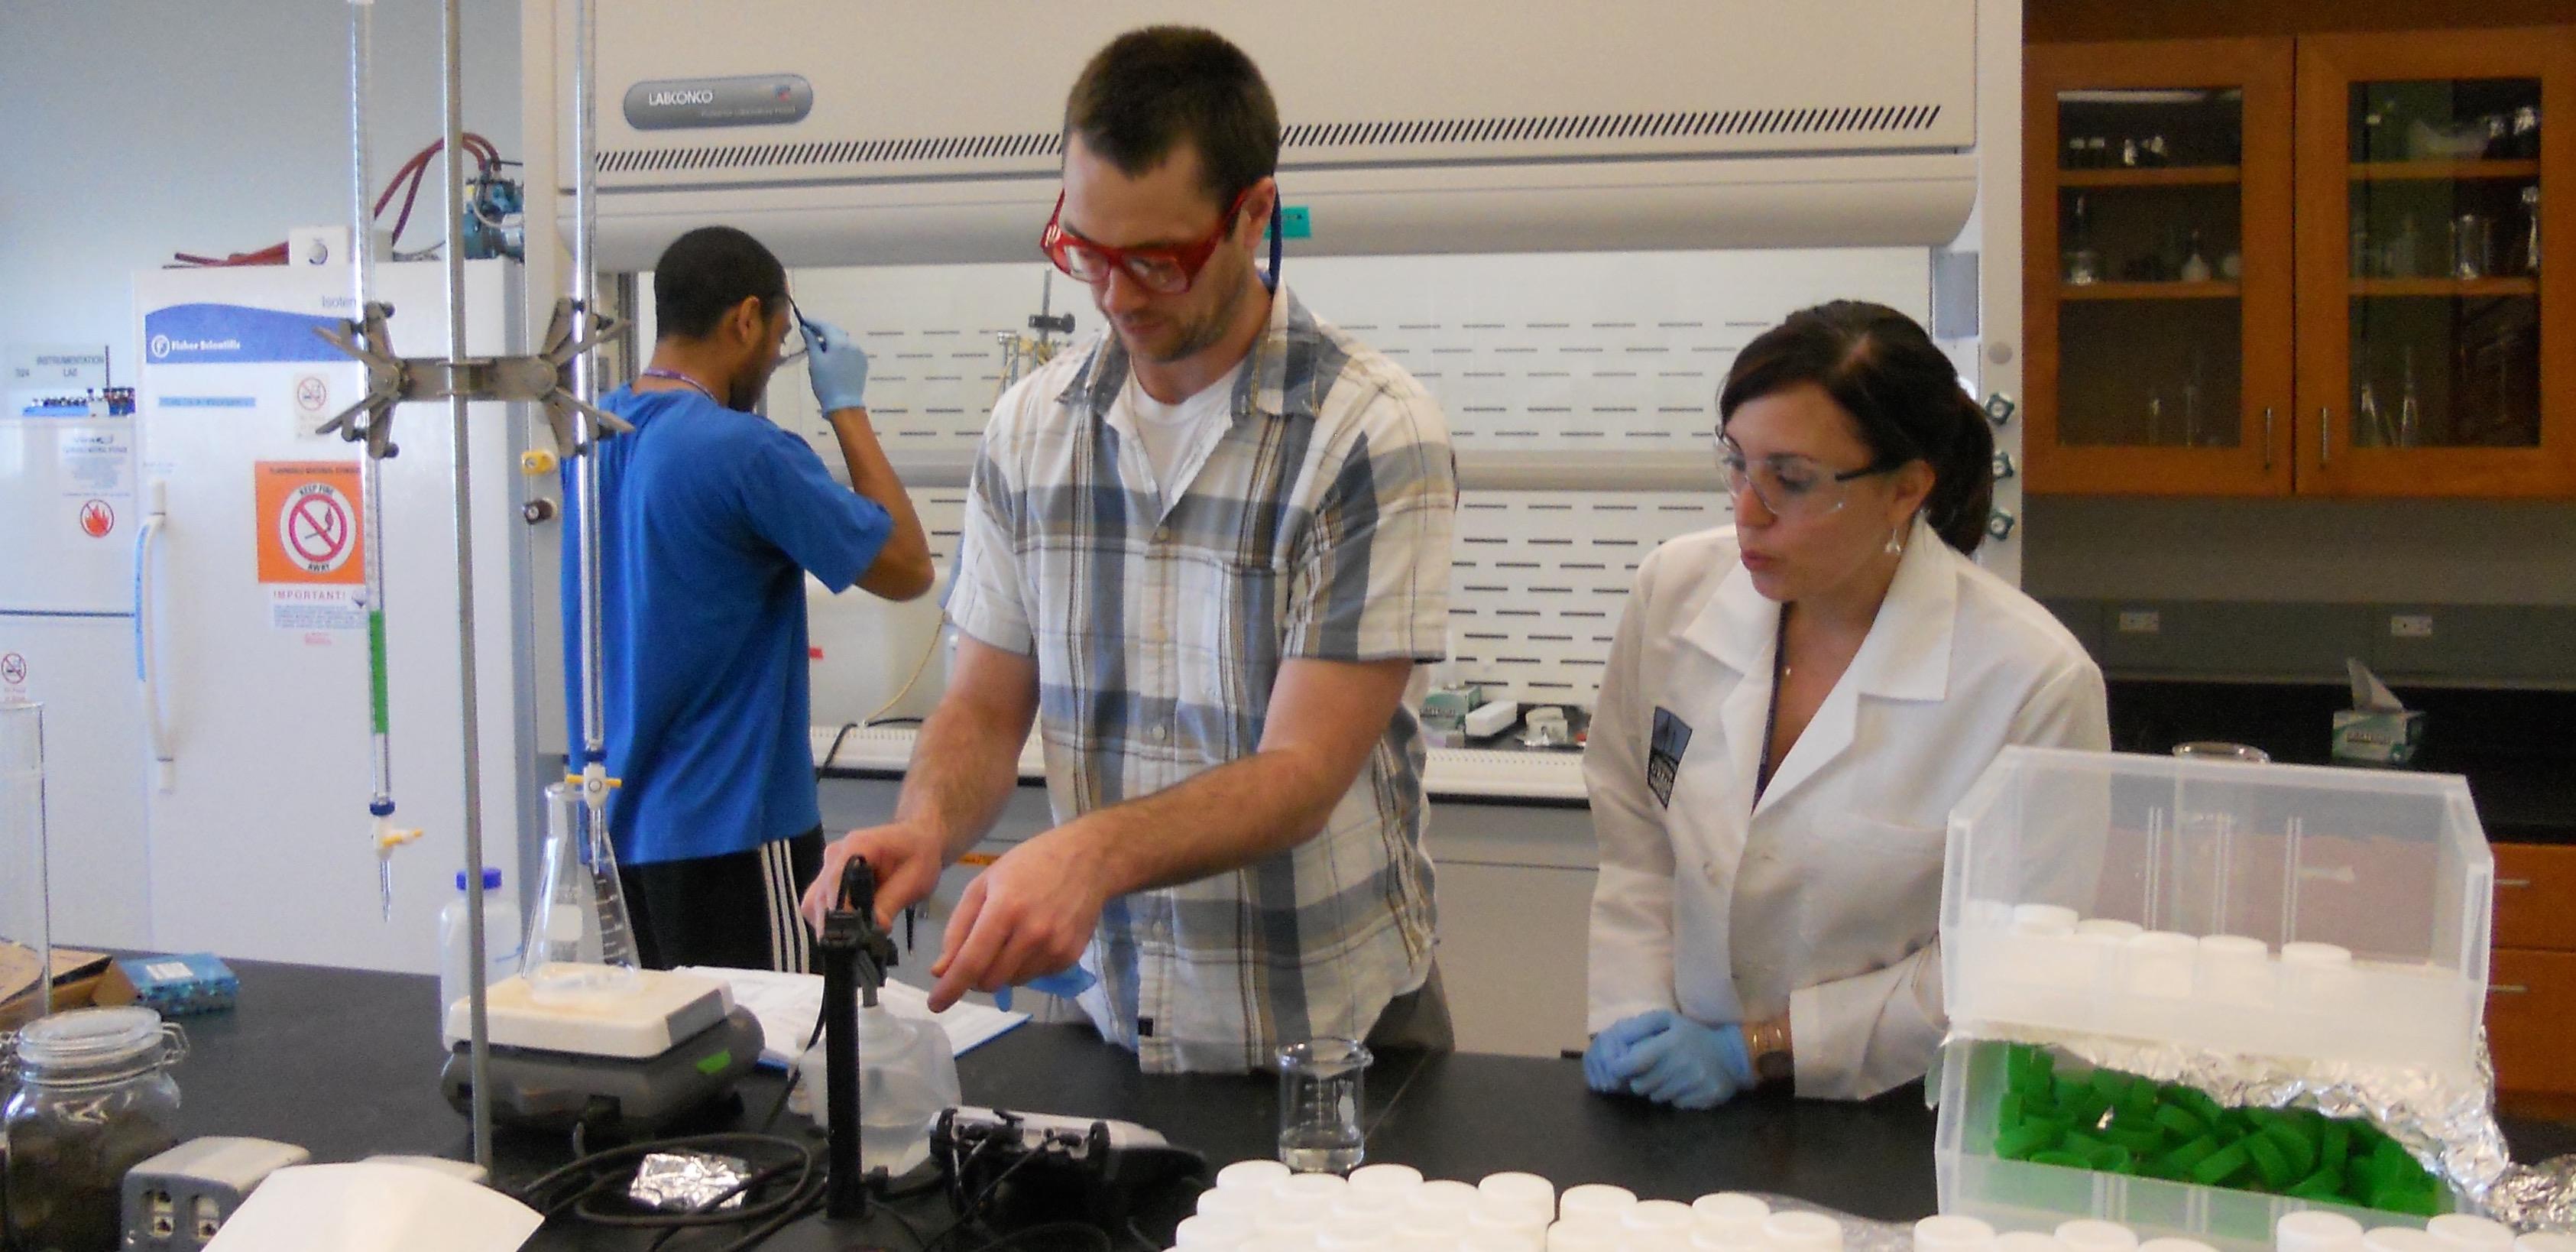 Former postdoctoral researcher Justin Miller-Schulze instructing student assistants